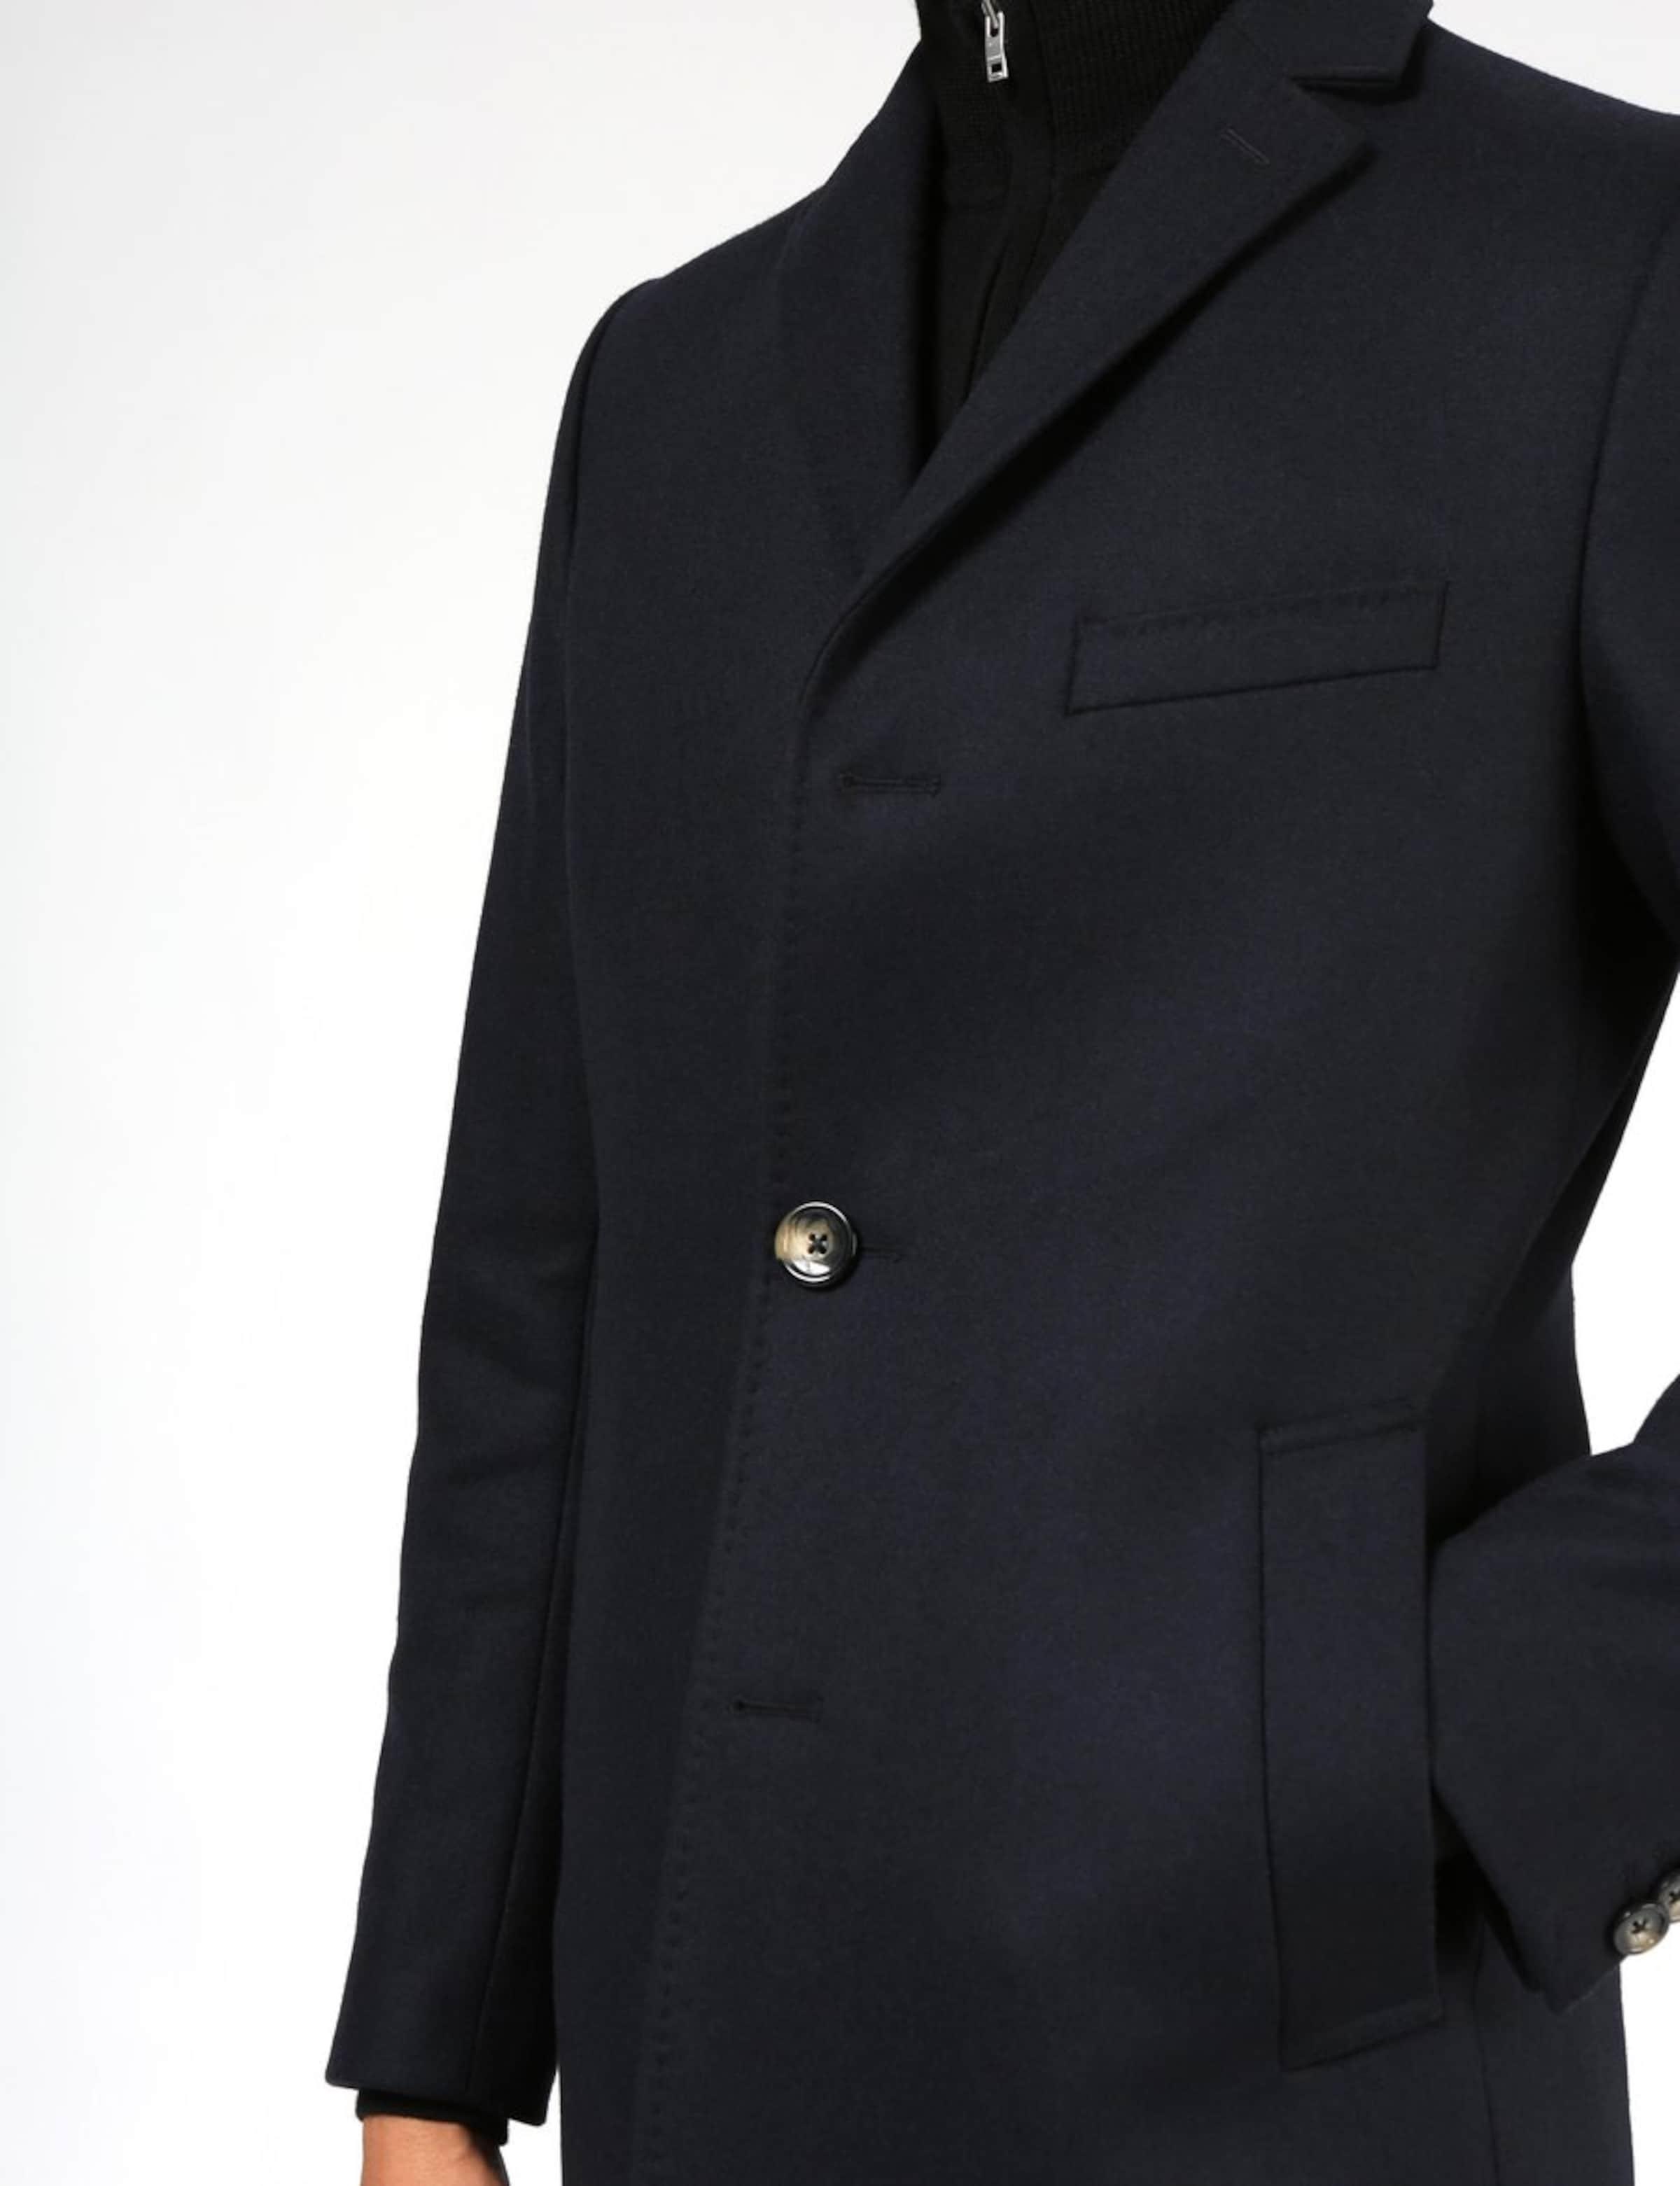 J.Lindeberg Mantel 'Wolger 77 Compact Melton' Limit Rabatt Mode-Stil Günstiger Preis Gutes Verkauf Günstiger Preis Besuchen Sie Günstig Online 5XtIp